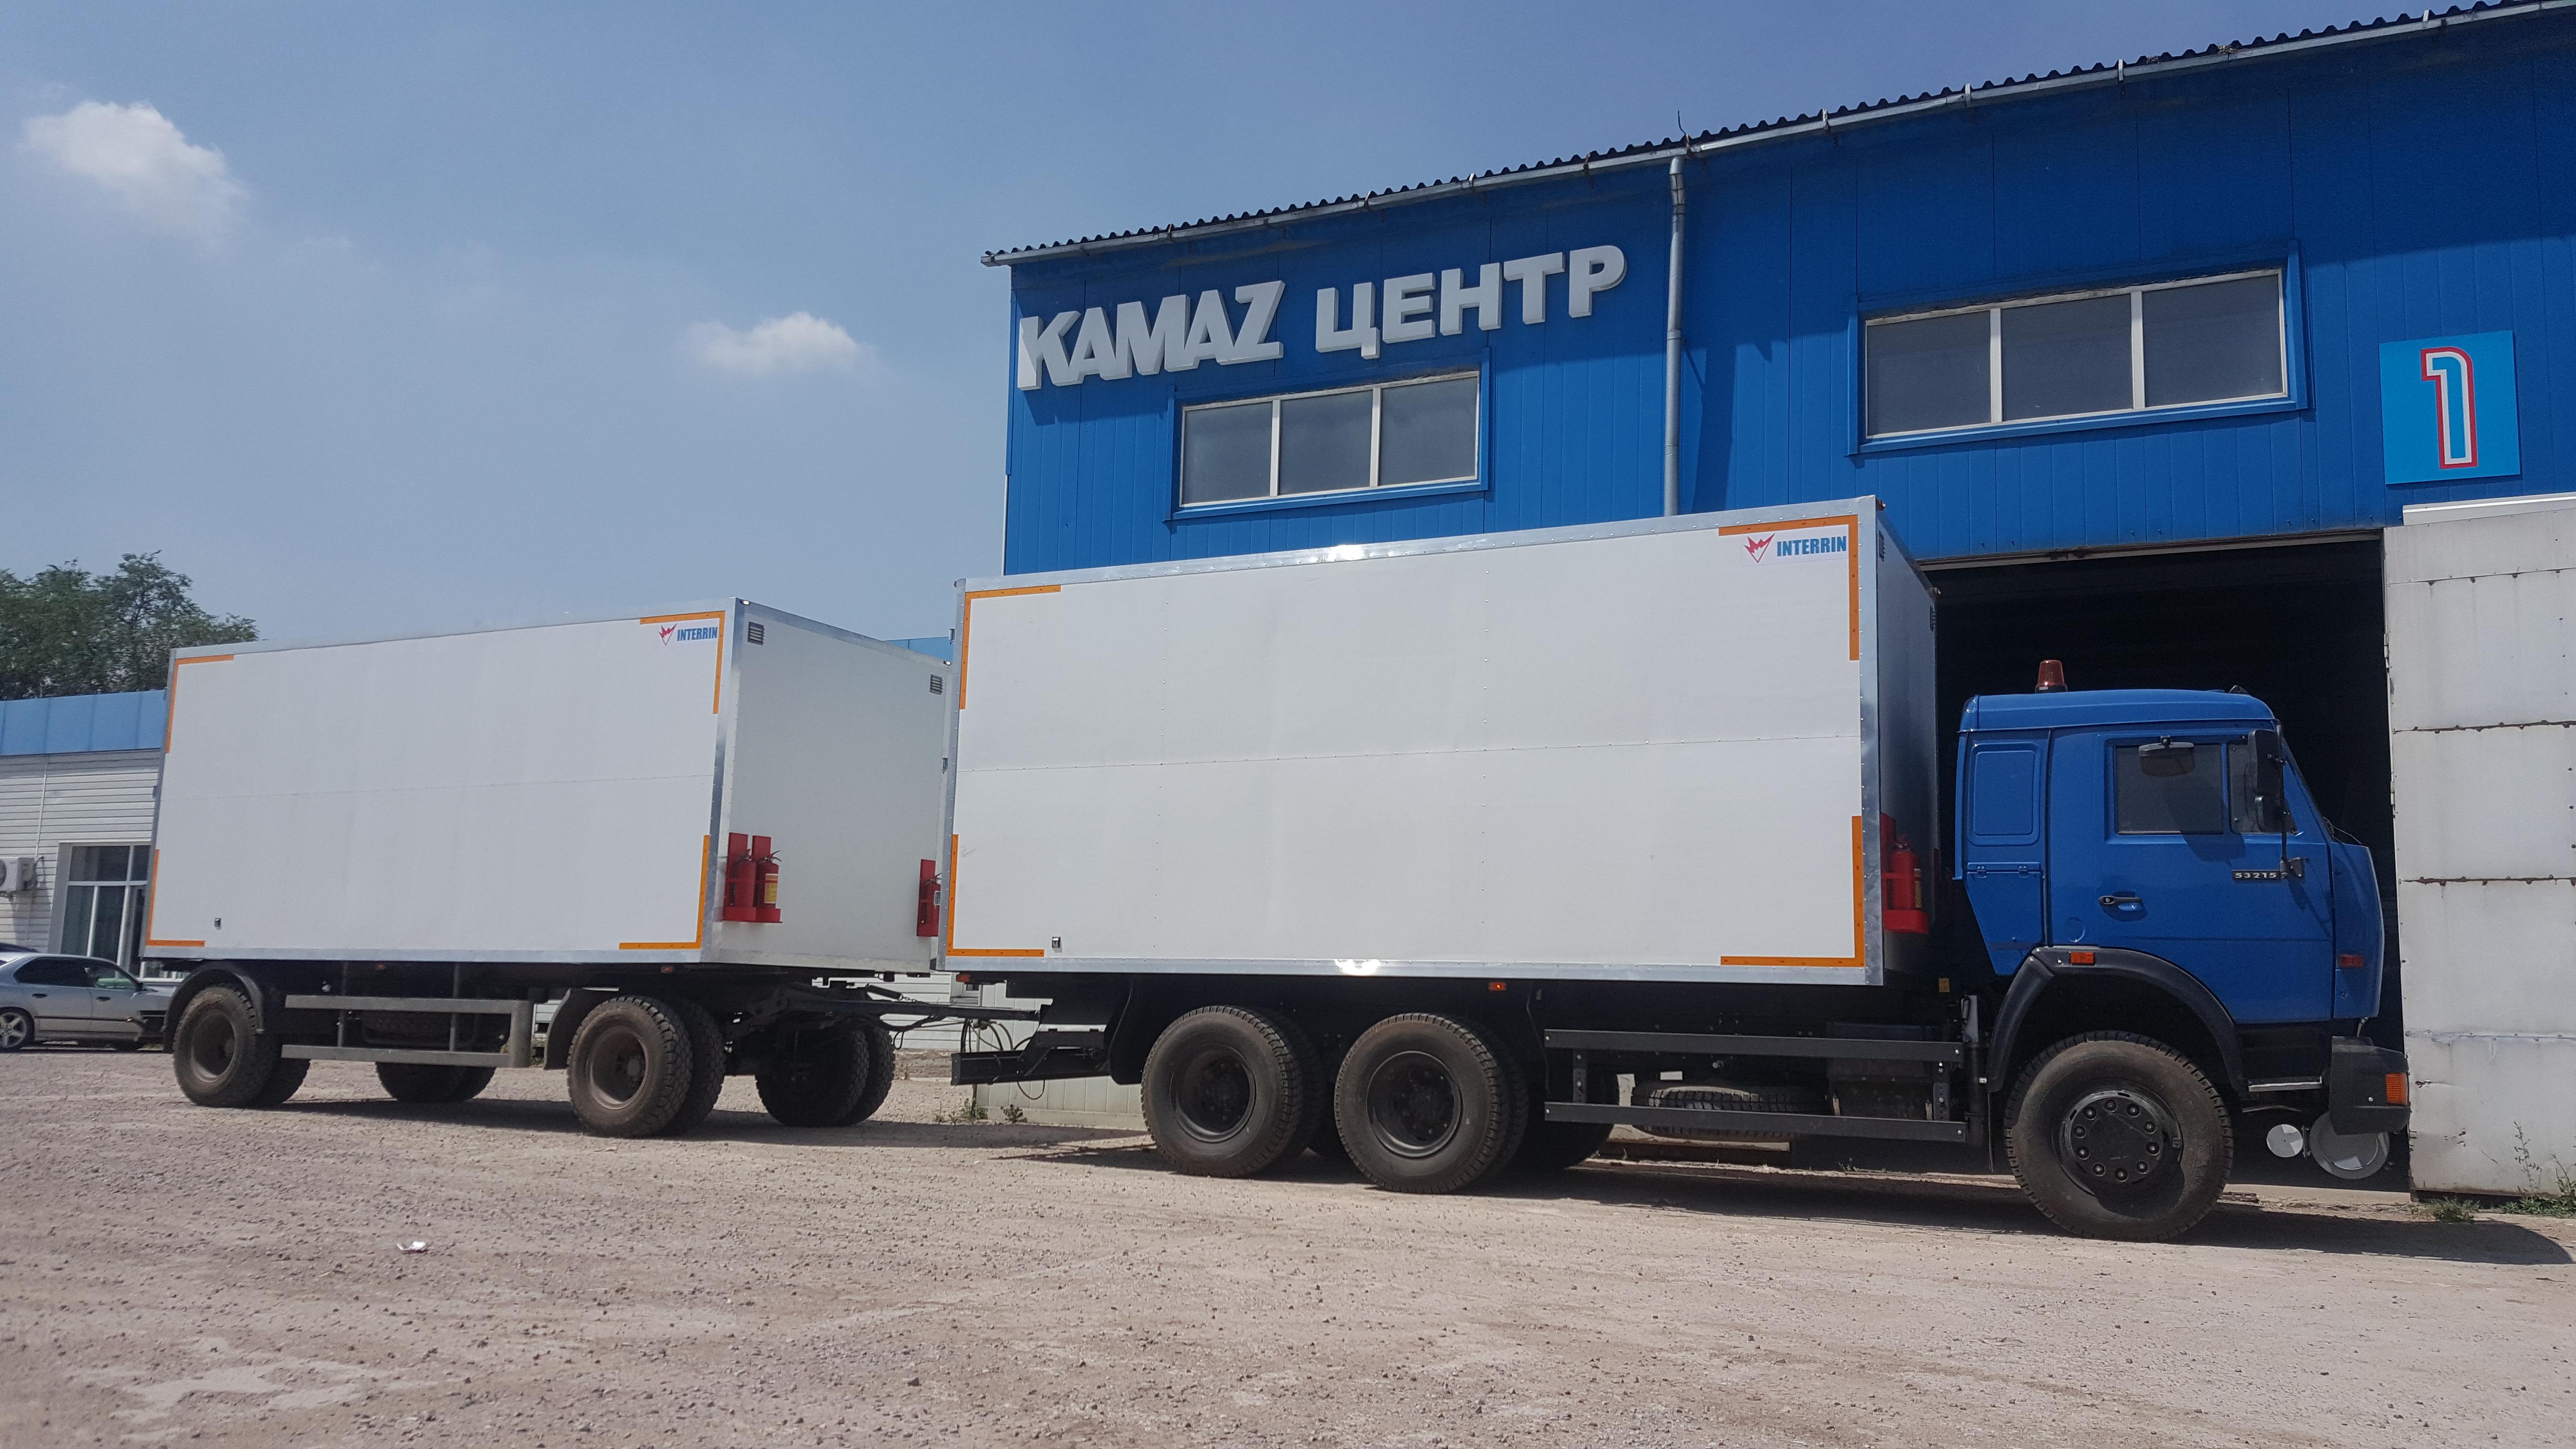 Фургон предназначенный для перевозки опасного груза 1 класса на КАМАЗ 53215-052-15 |У ОФИЦИАЛЬНОГО ДИЛЕРА  КАМАЗ